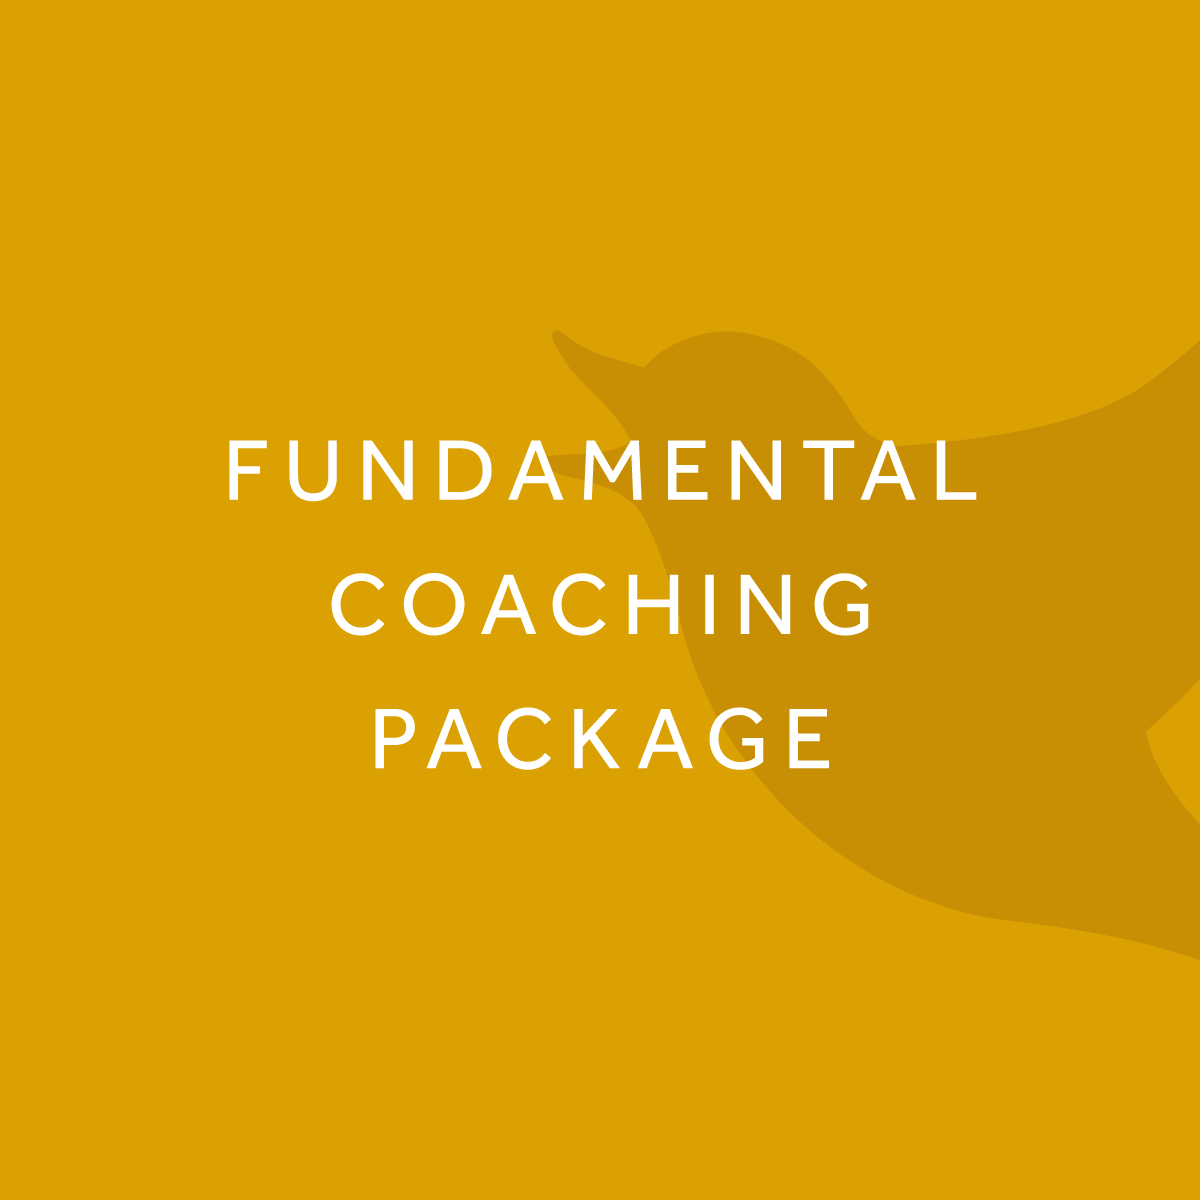 Fundamental-Coaching-Package.png